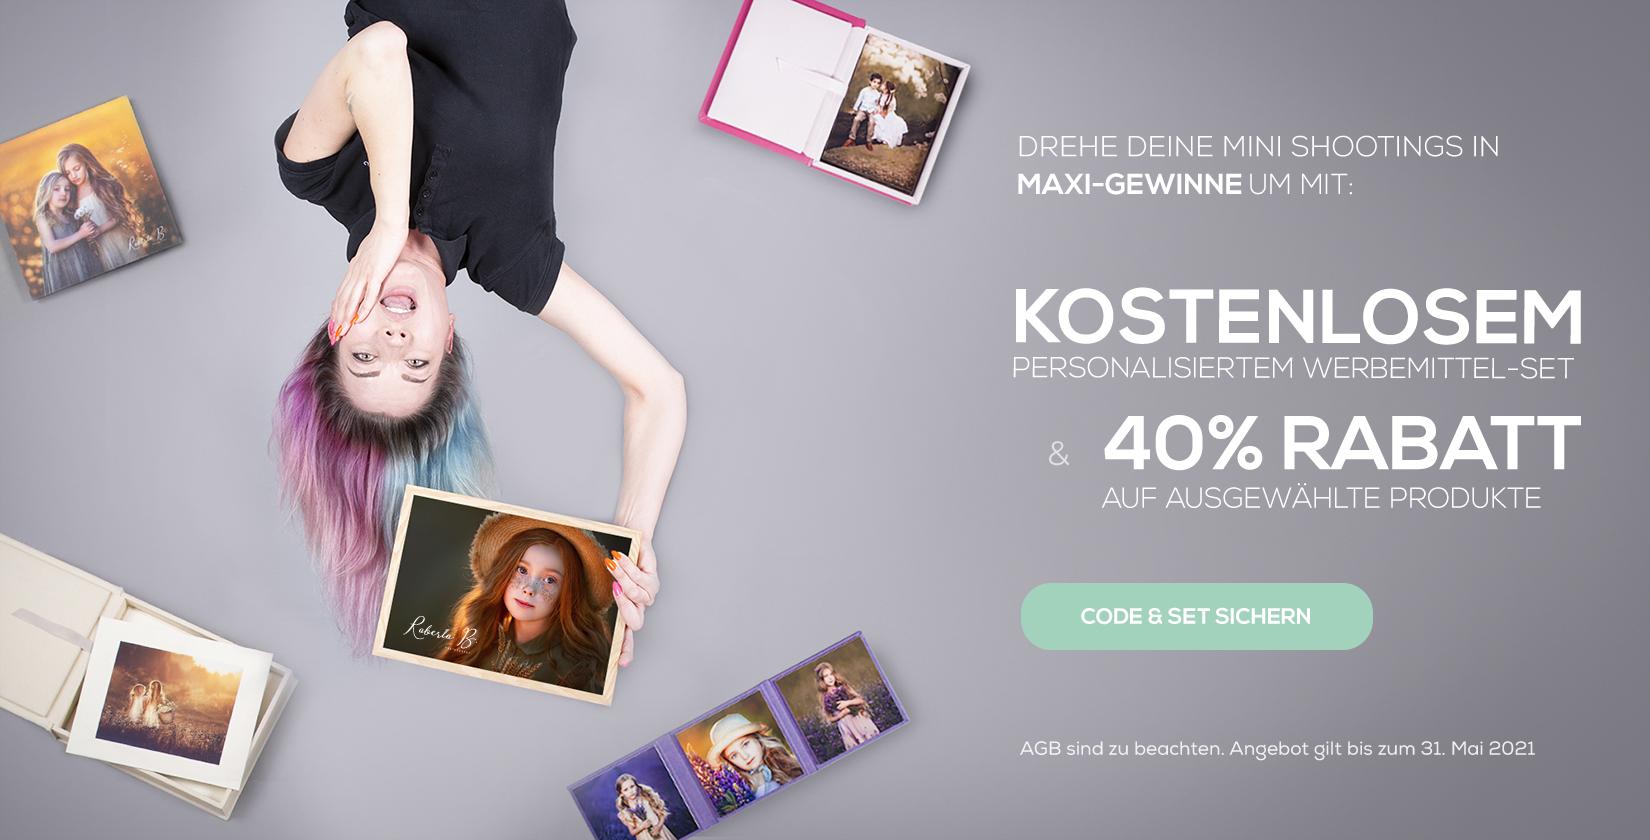 Frühlings-Shootings - Mini Aufwand für Maxi Gewinne